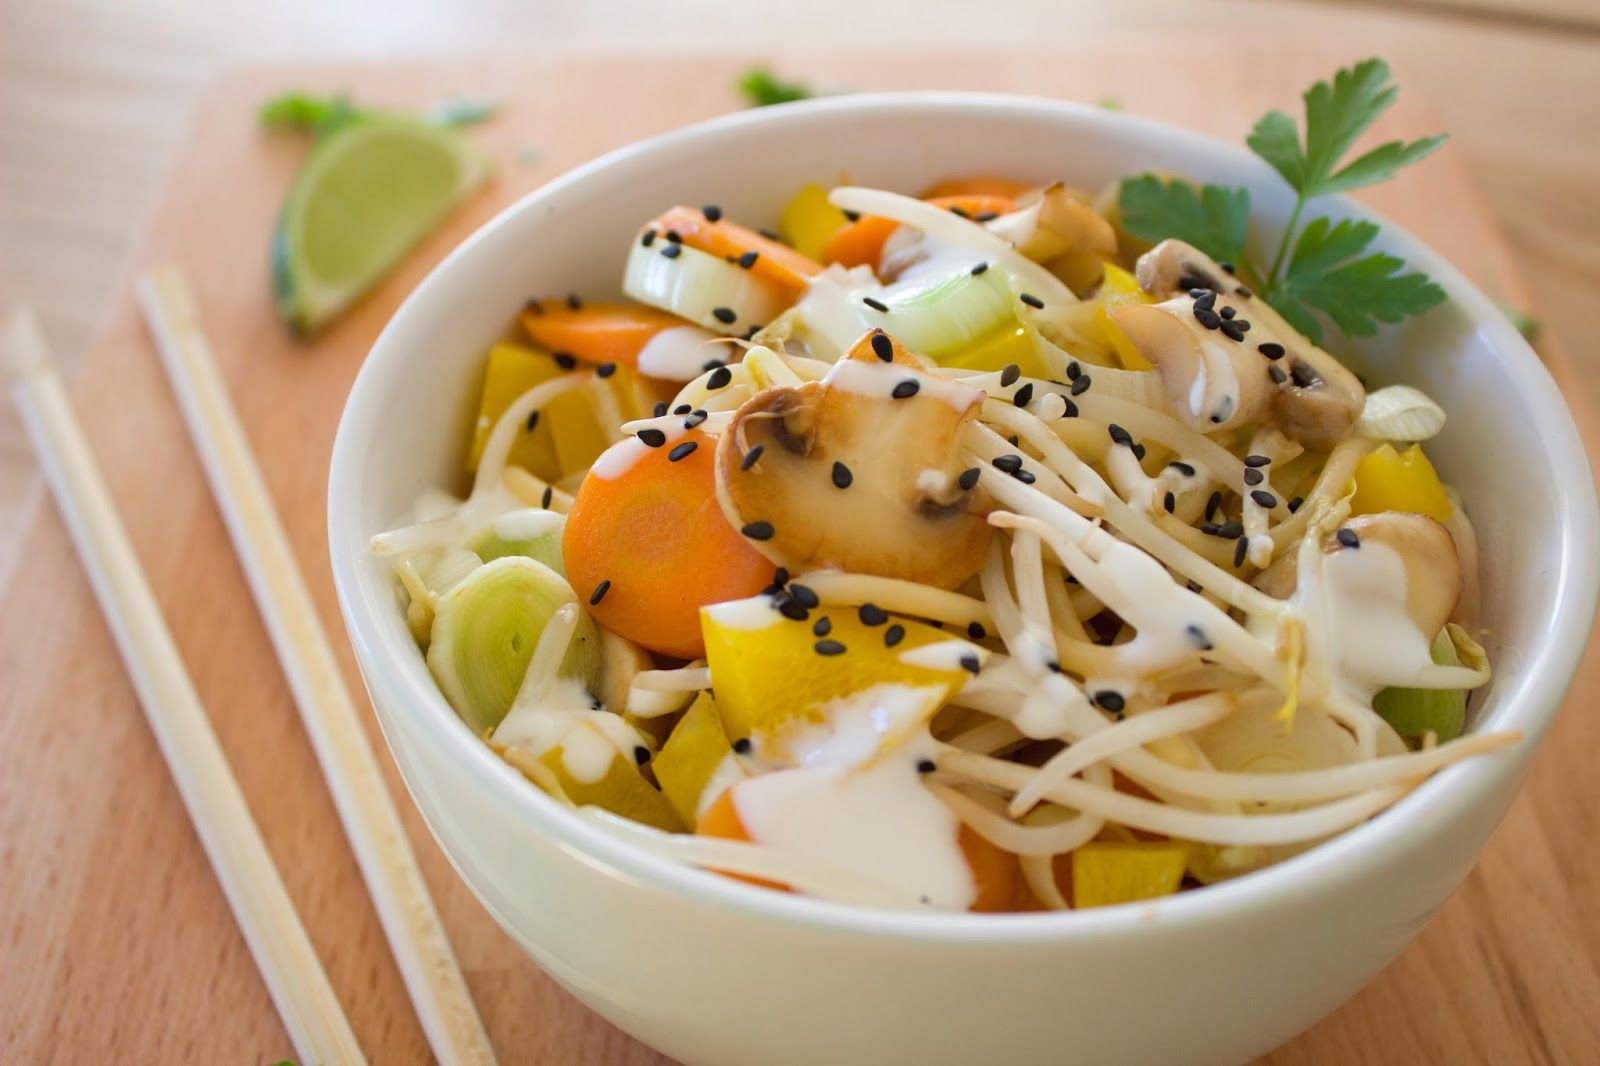 Asia Salat mit Spaghetti, Gemüse, und Joghurt-Limettendressing. Who likes? >>